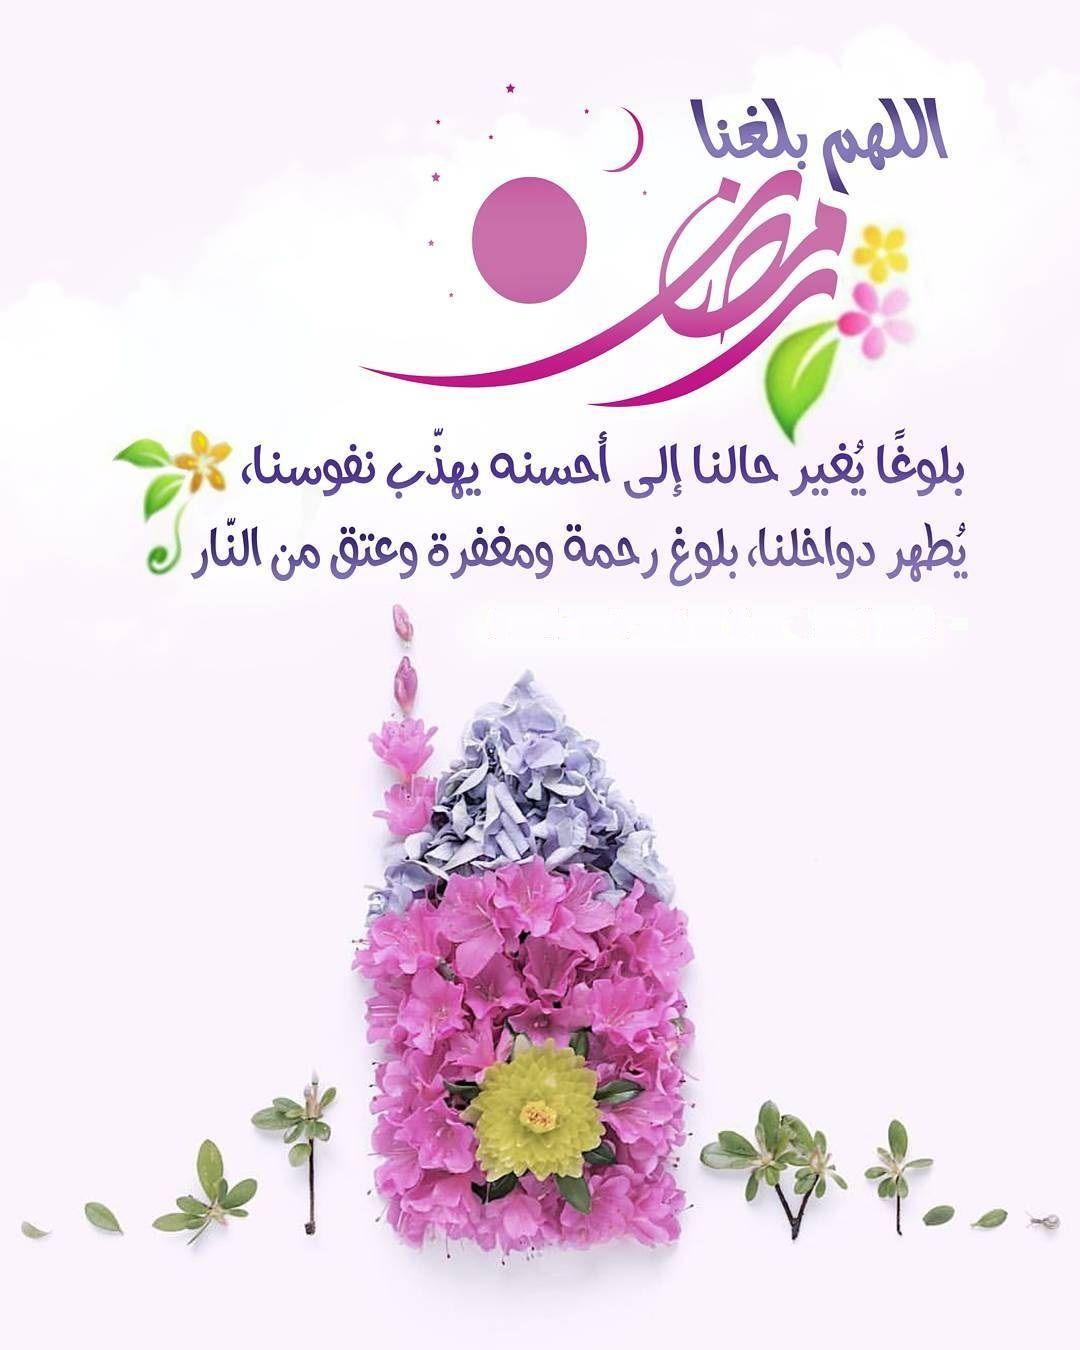 Desertrose Ramadan Kareem كل عام وأهلي وأحبابي وجميع الم سلمين بخير Ramadan Kareem Decoration Ramadan Crafts Ramadan Images